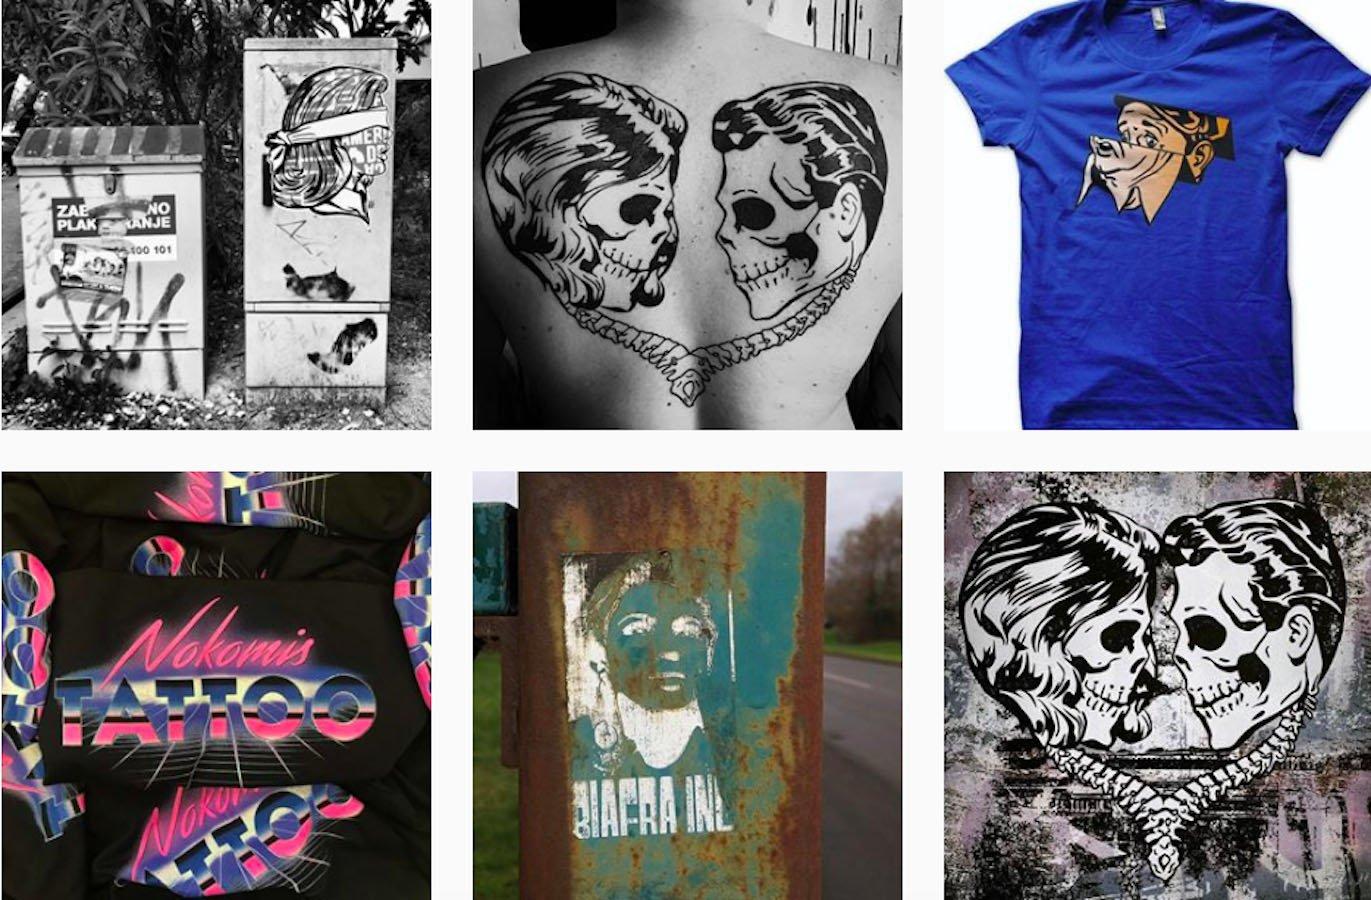 Web Design Inspiration: 110+ Accounts On Instagram and 10+ Best UX & Web Design Books in 2020 - biafrainc